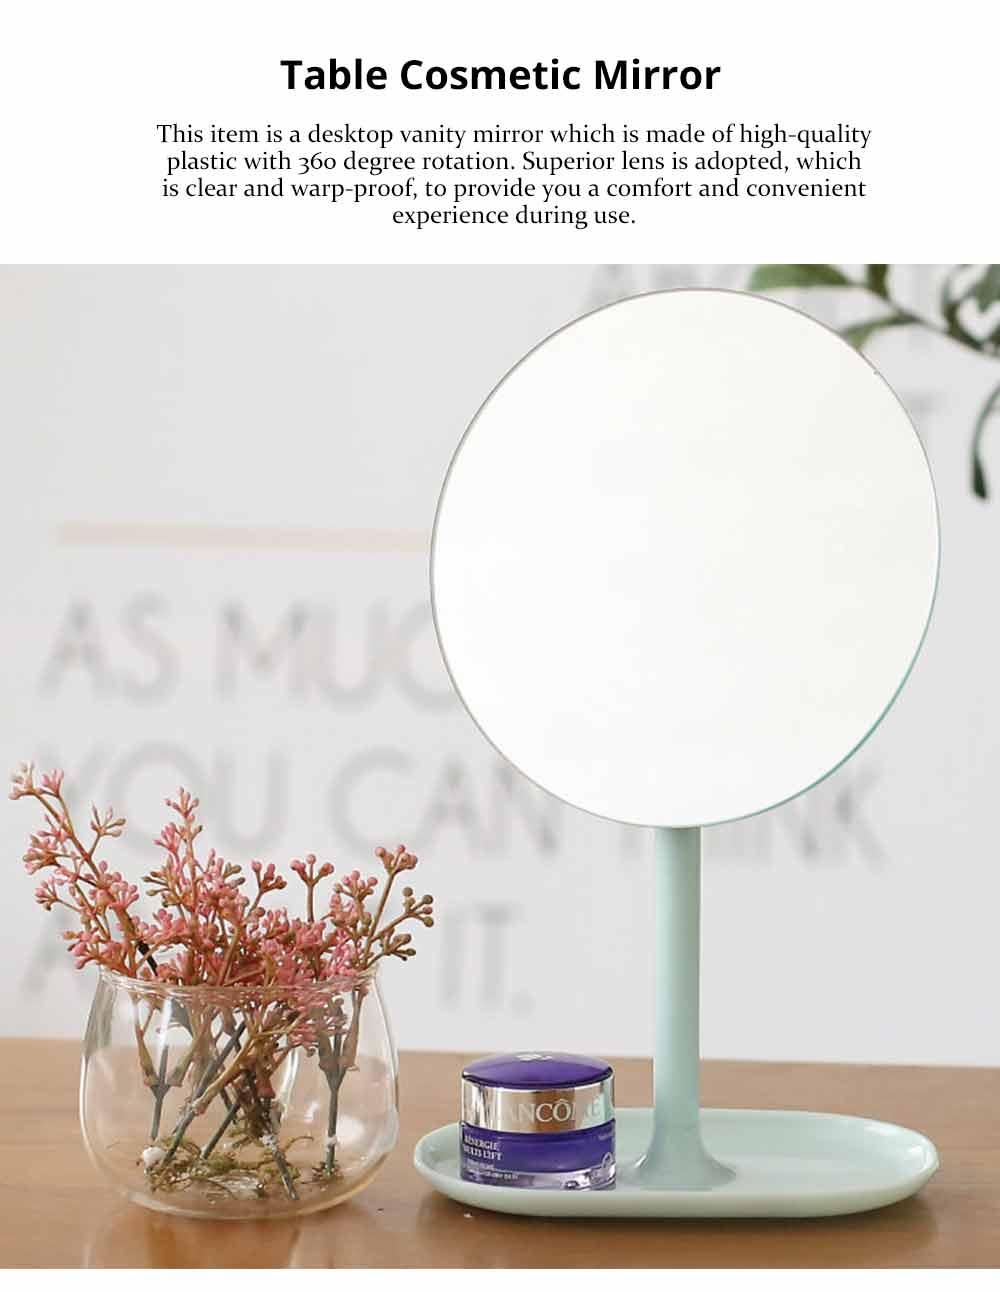 Table Top Vanity Mirror - Table Cosmetic Mirror For Vanity, One-Sided Round Cosmetic Mirror For Makeup 6